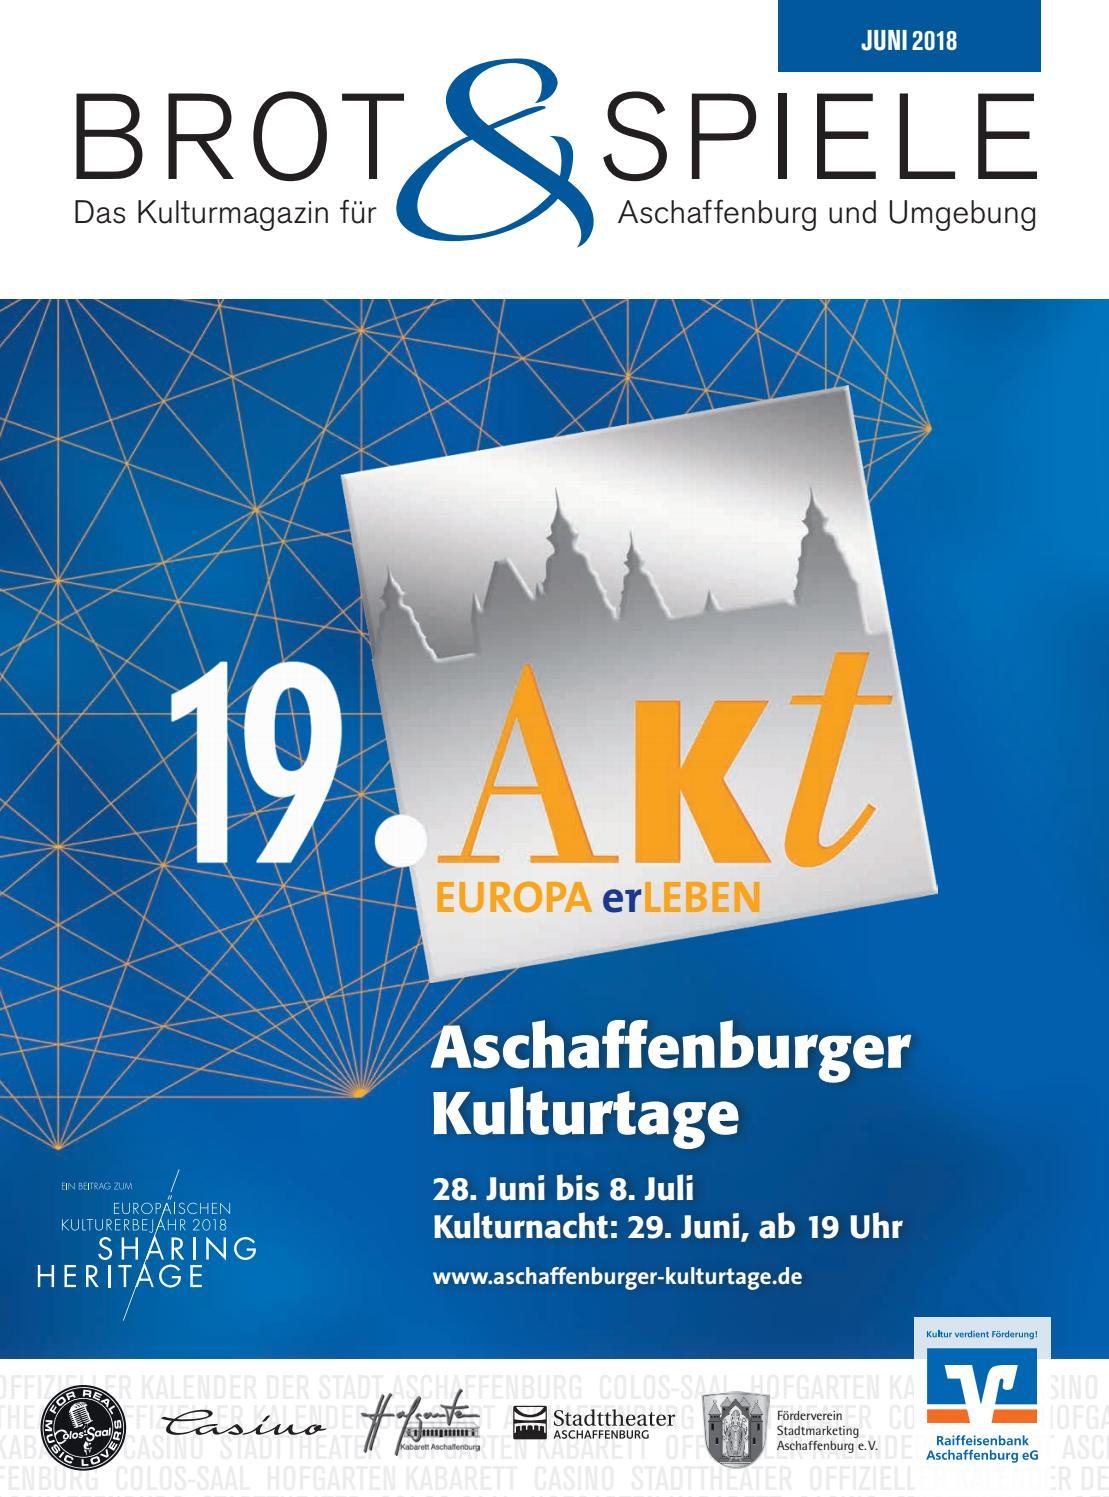 Brot & Spiele 06|2018 by MorgenWelt Verlag issuu